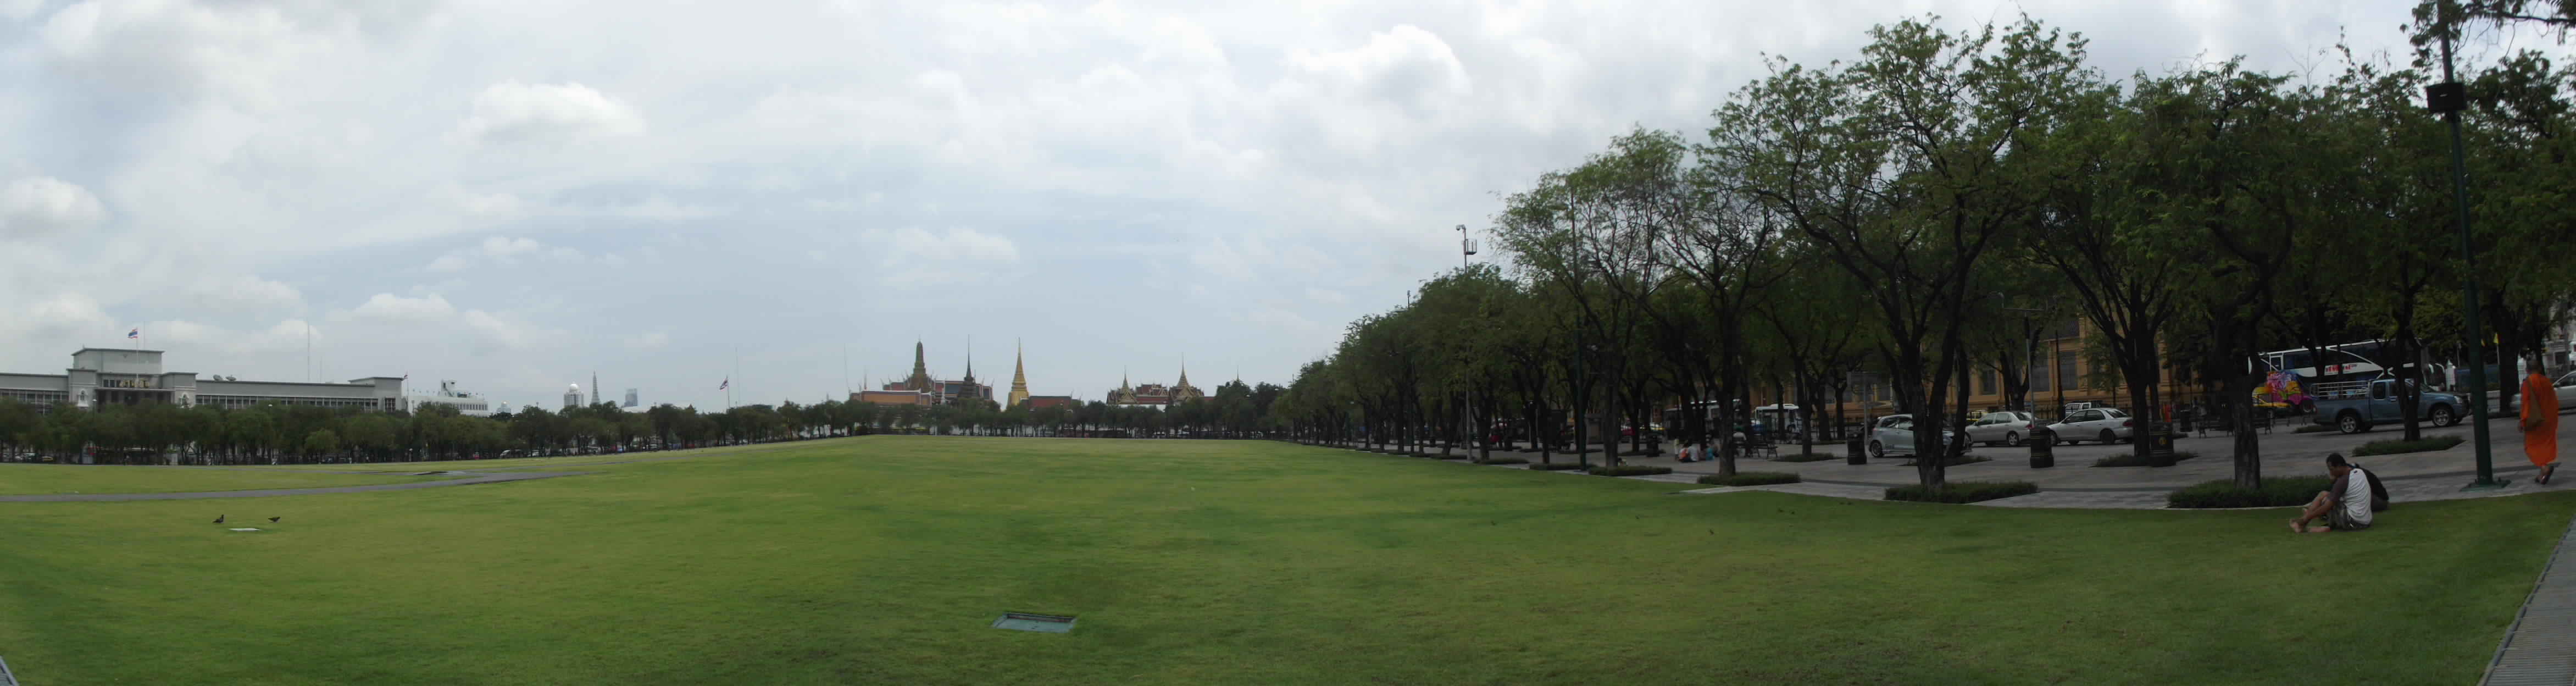 bangkok temple skyline